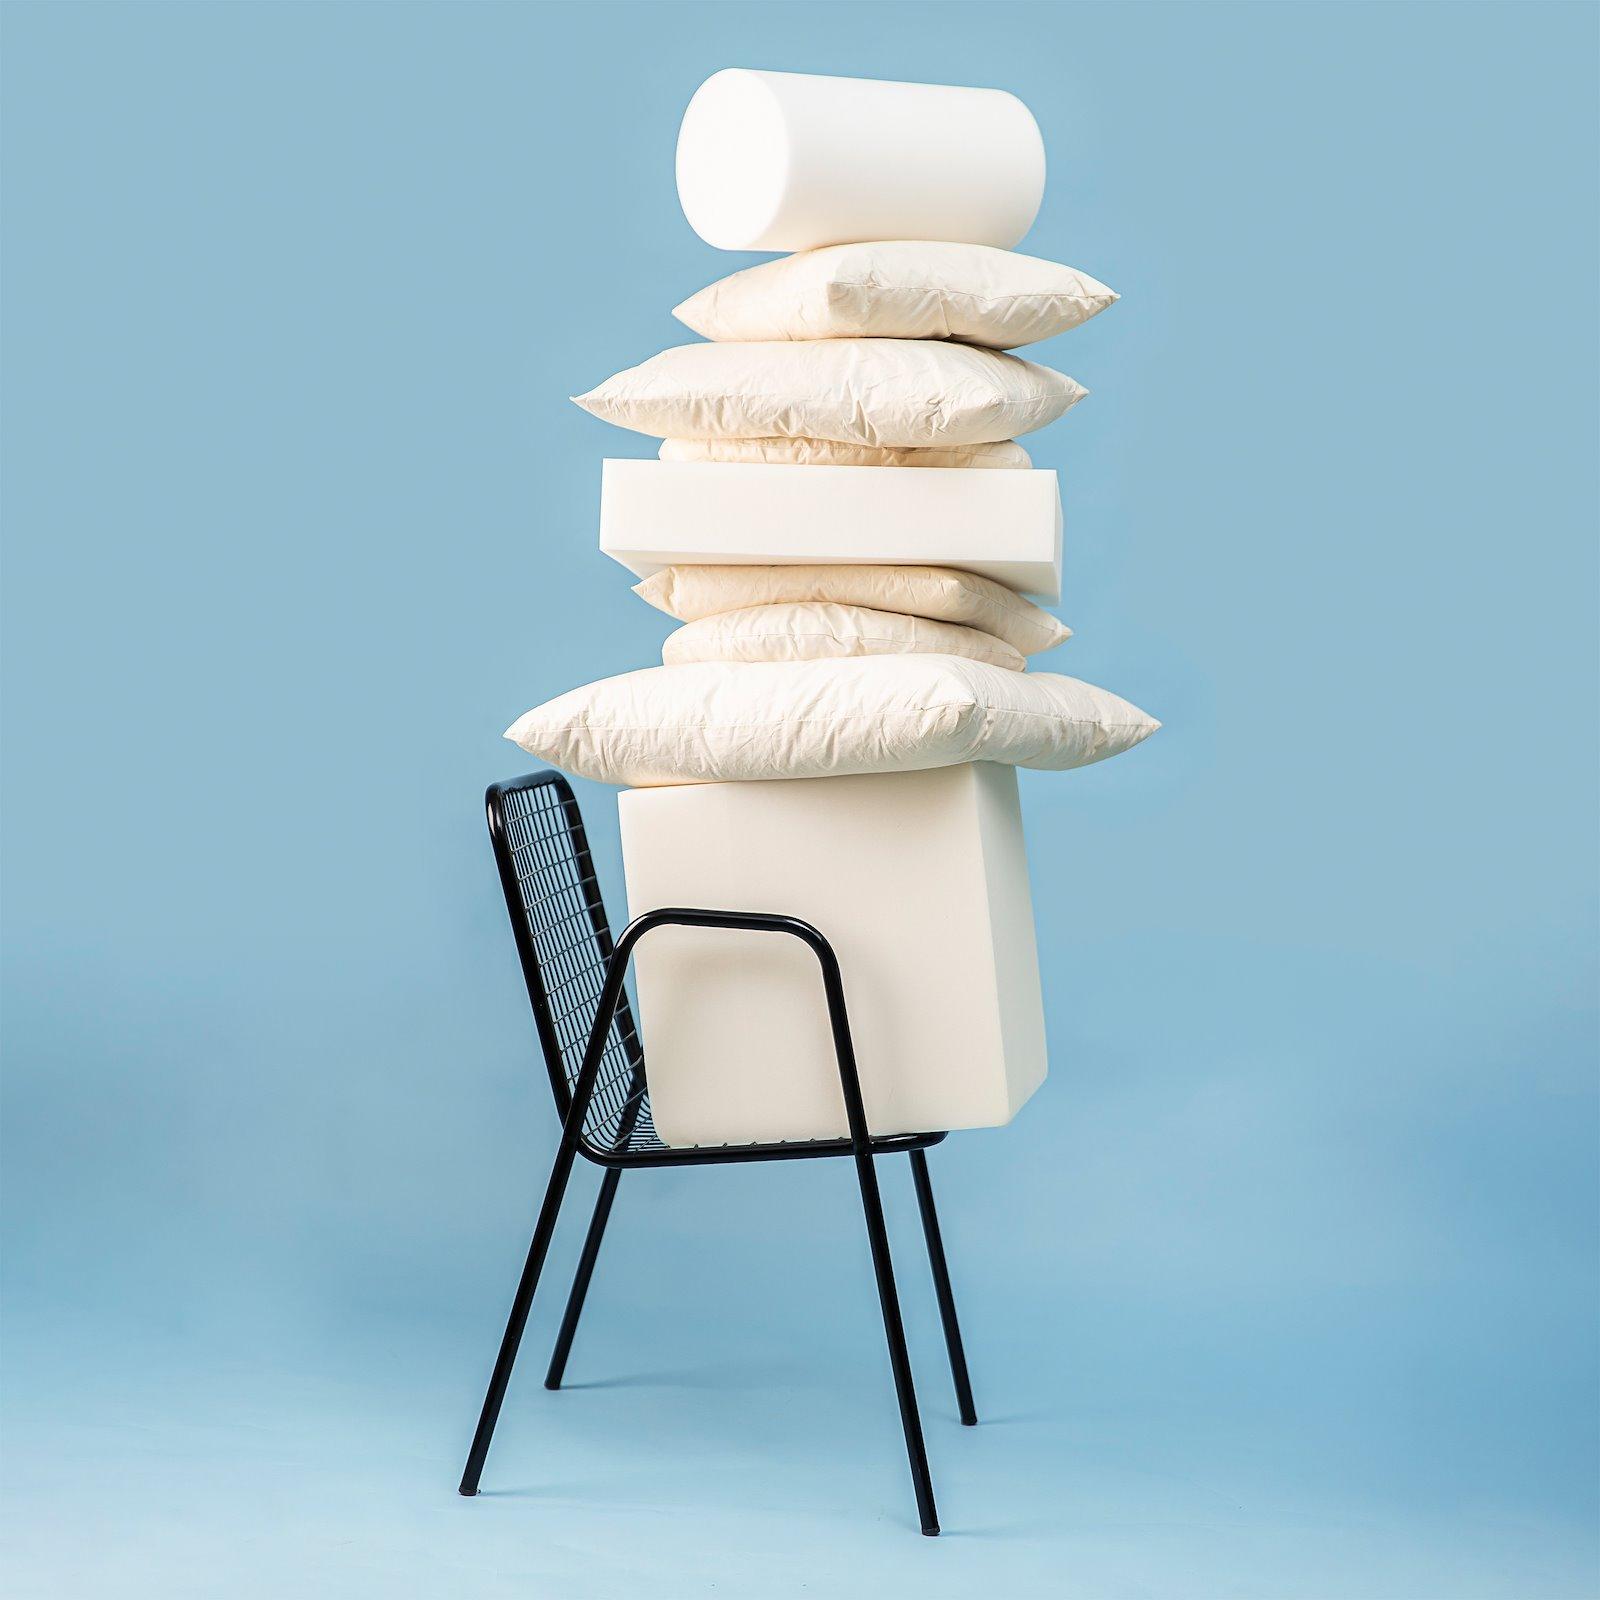 Cushion w/nature filling 50x50cm creme 38080061_38080002_38098050_38070048_38070045_38070061_38070050_38070060_bundle